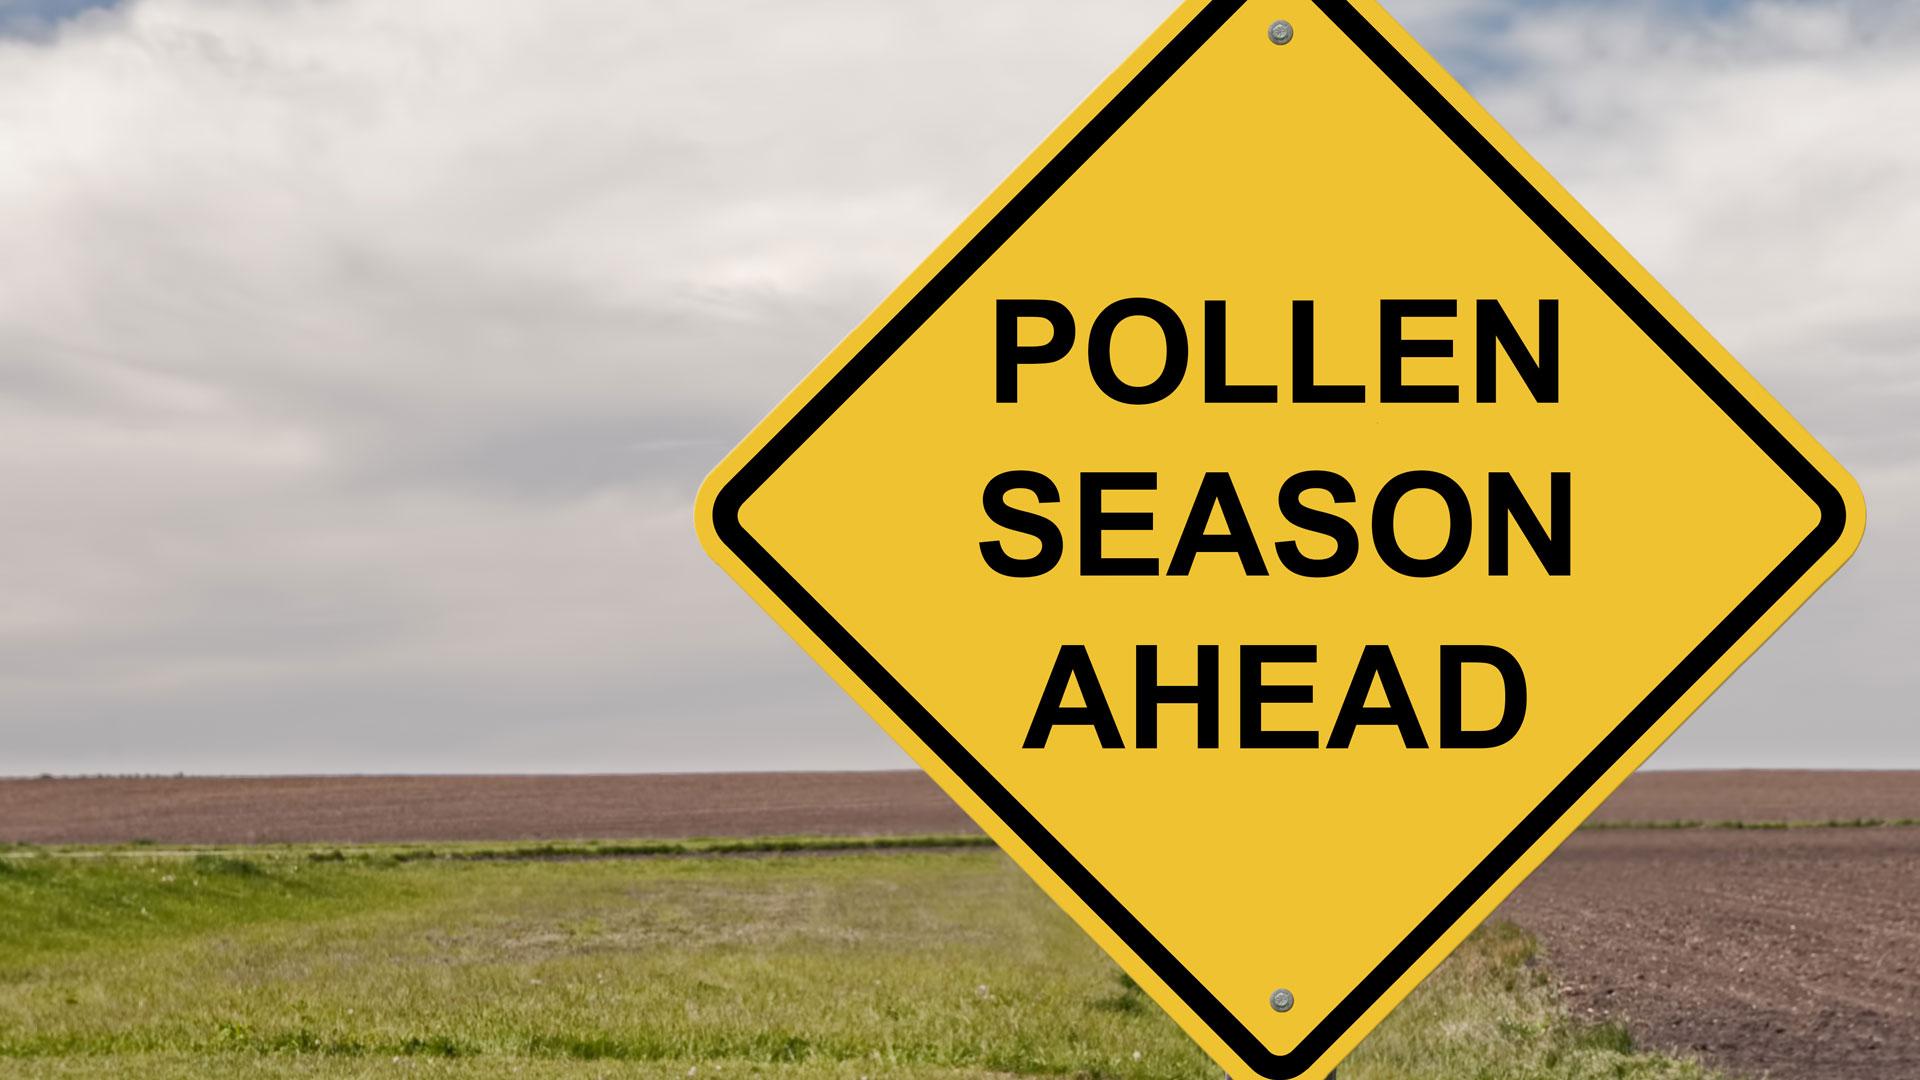 Pollen season ahead for drivers